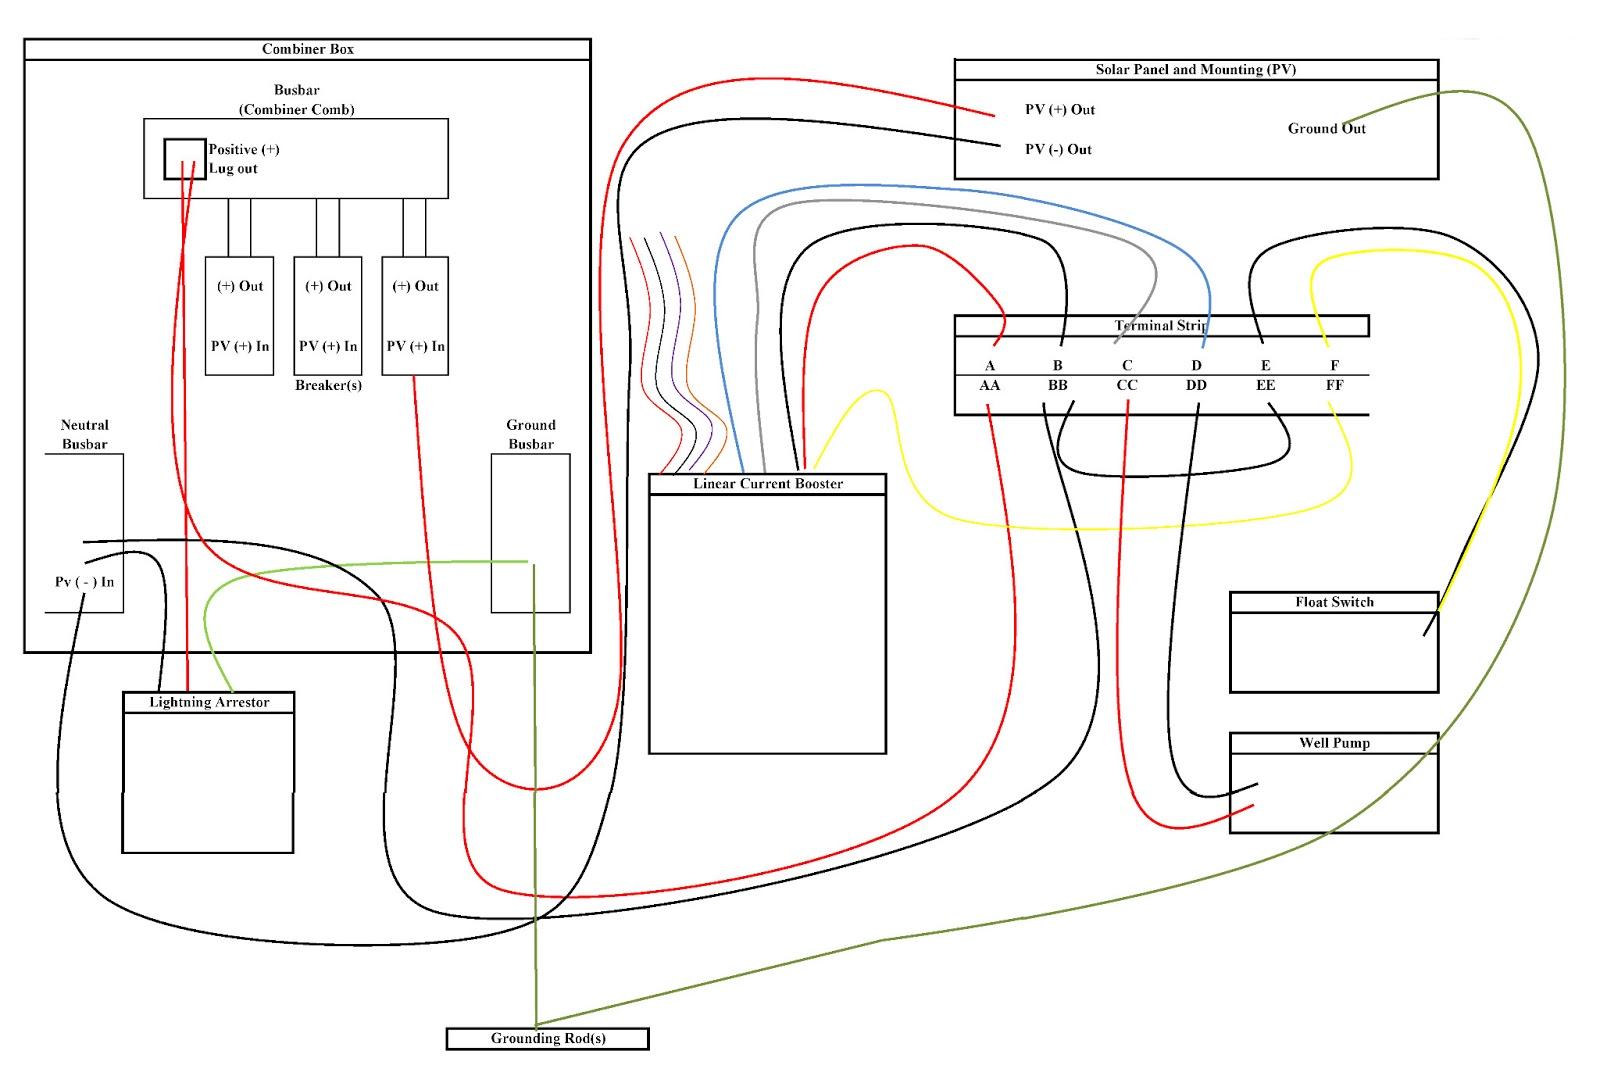 Beautiful Septic Pump Wiring Diagram Gallery Wiring Diagram Ideas Solar%2BWell%2BPump%2BWiring